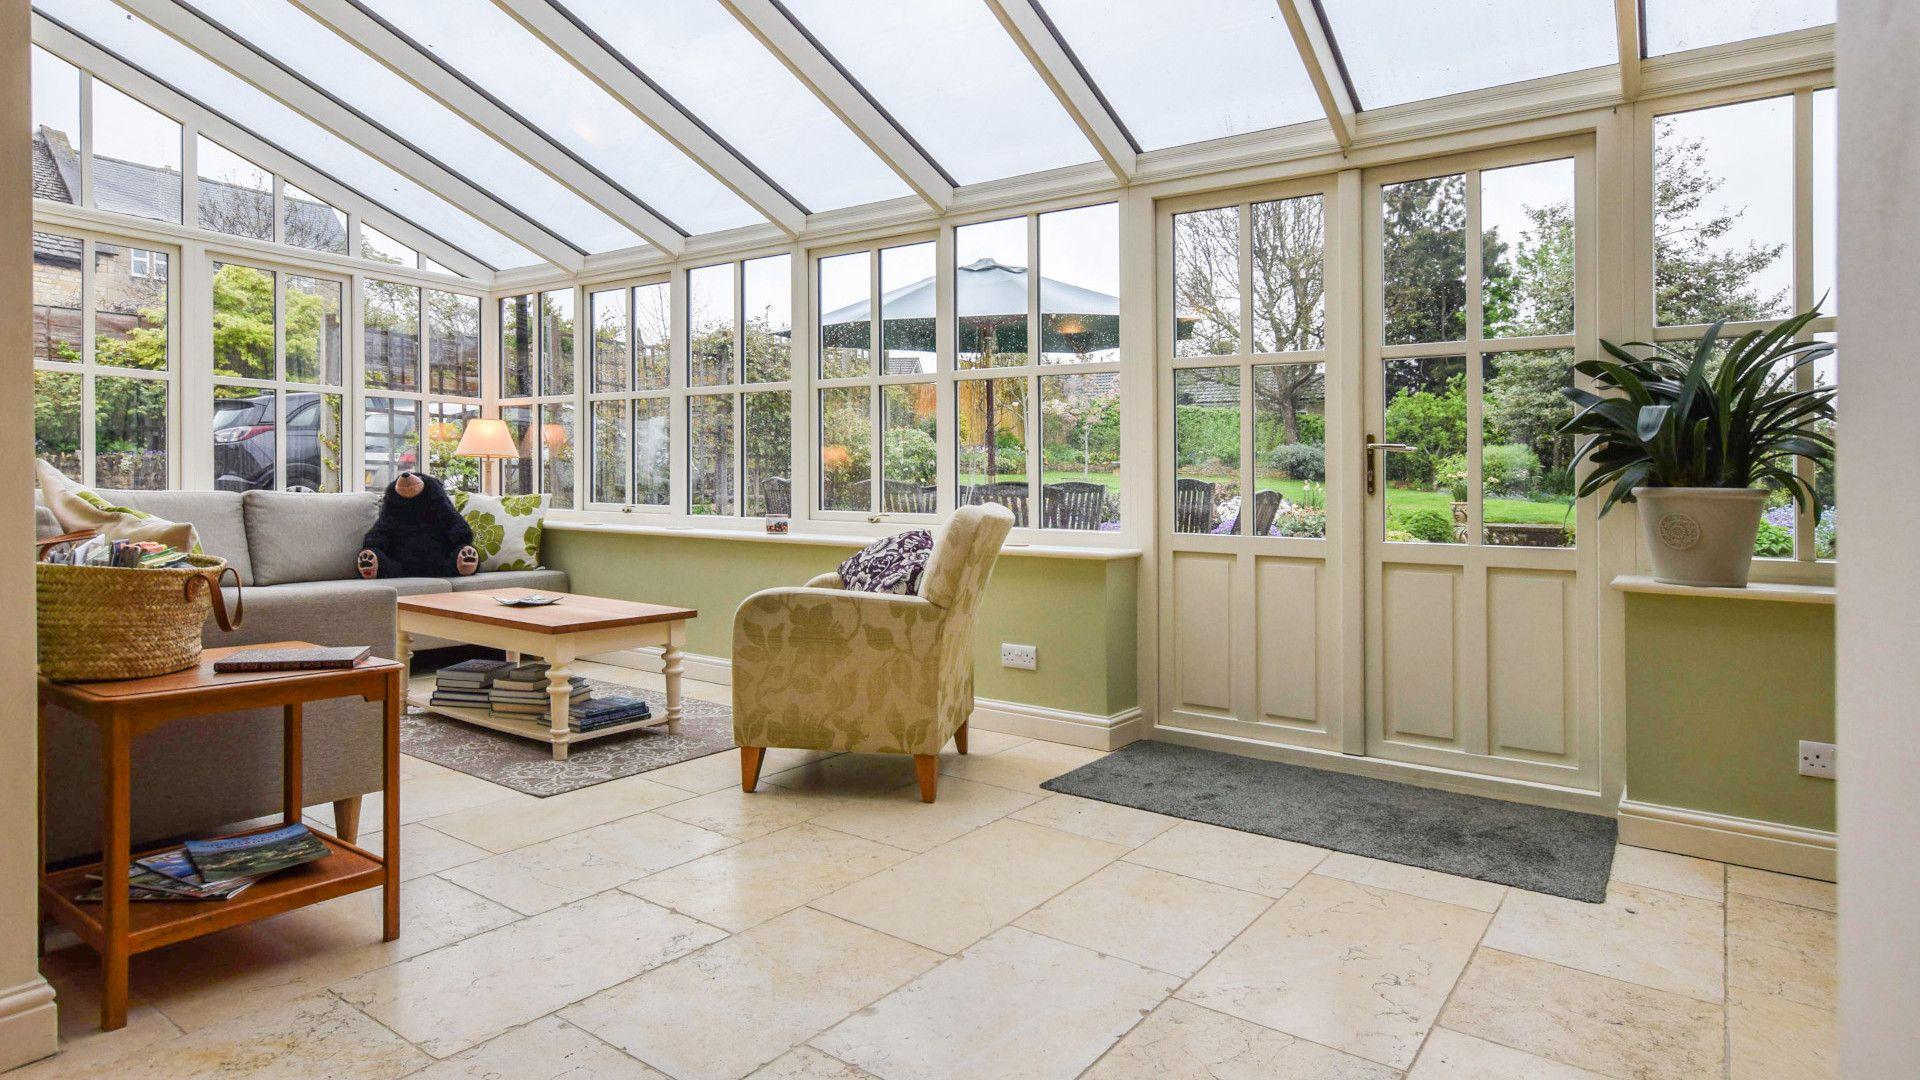 Conservatory with seating, Barebones Farm, Bolthole Retreats